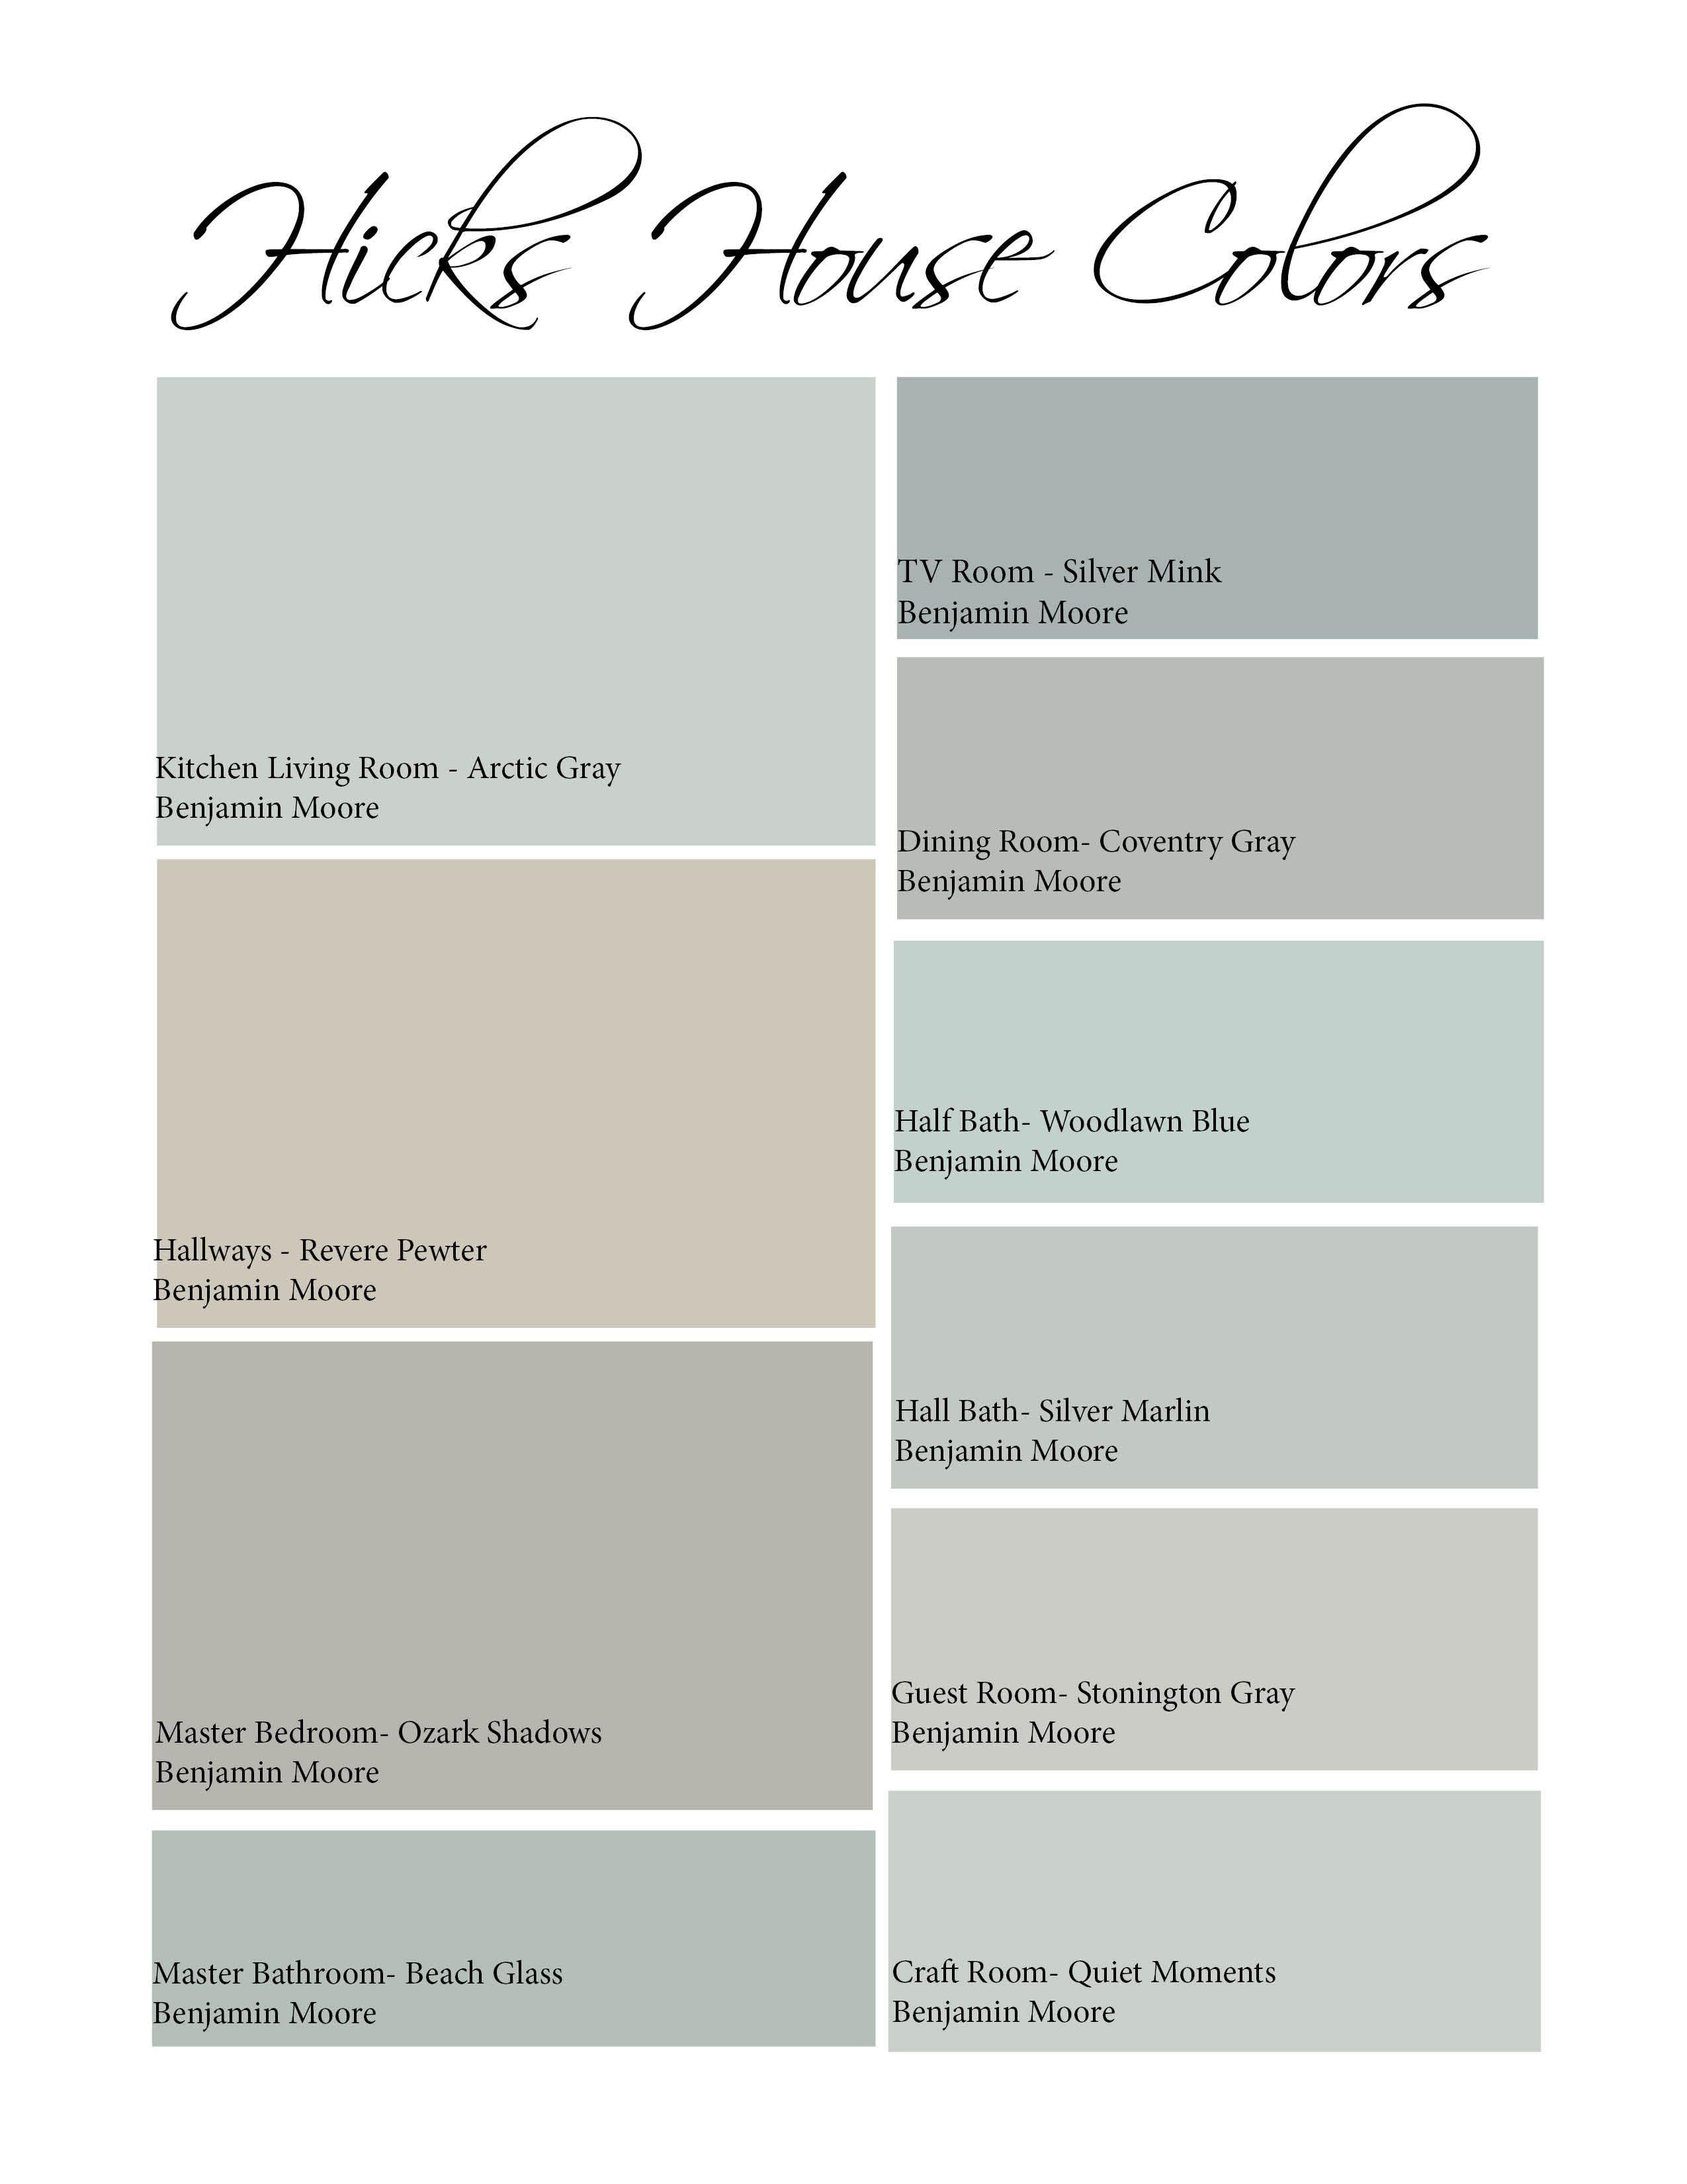 Color Pallet For Whole House House Colors Jpg 2 550 3 301 Pixels House Color Schemes Paint Colors For Home House Painting